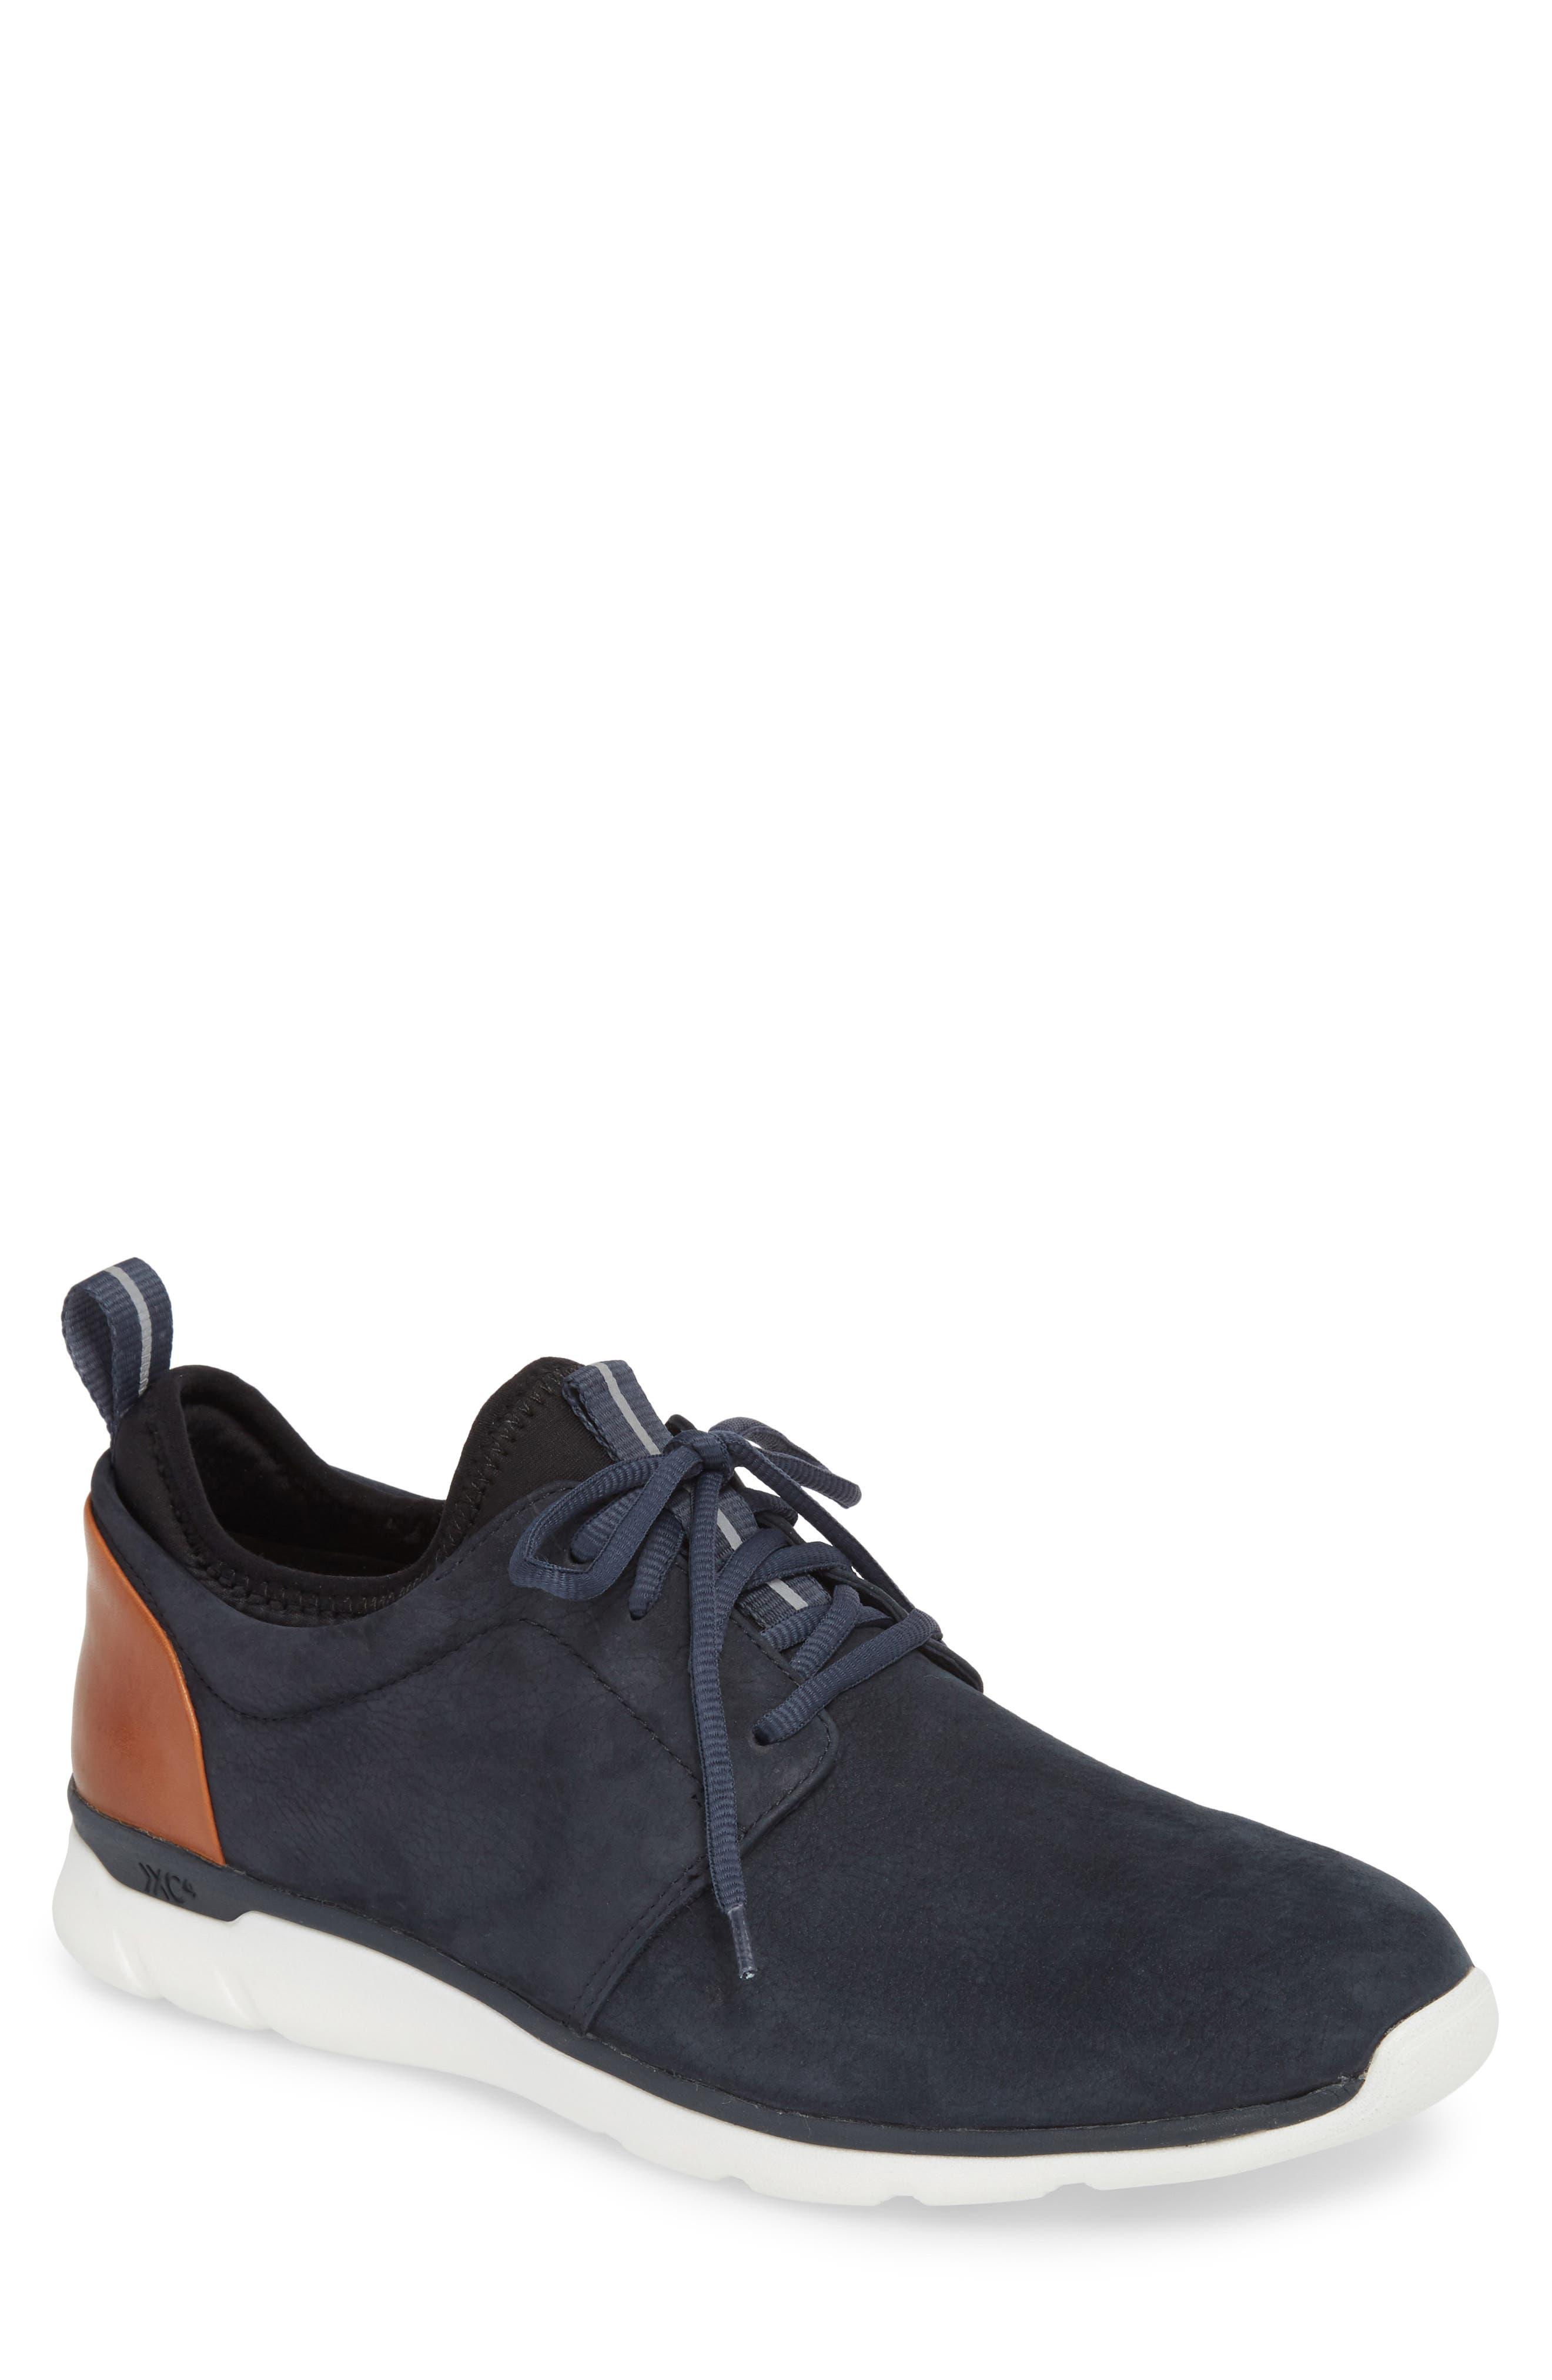 Prentiss XC4<sup>®</sup> Waterproof Low Top Sneaker,                         Main,                         color, Navy Nubuck